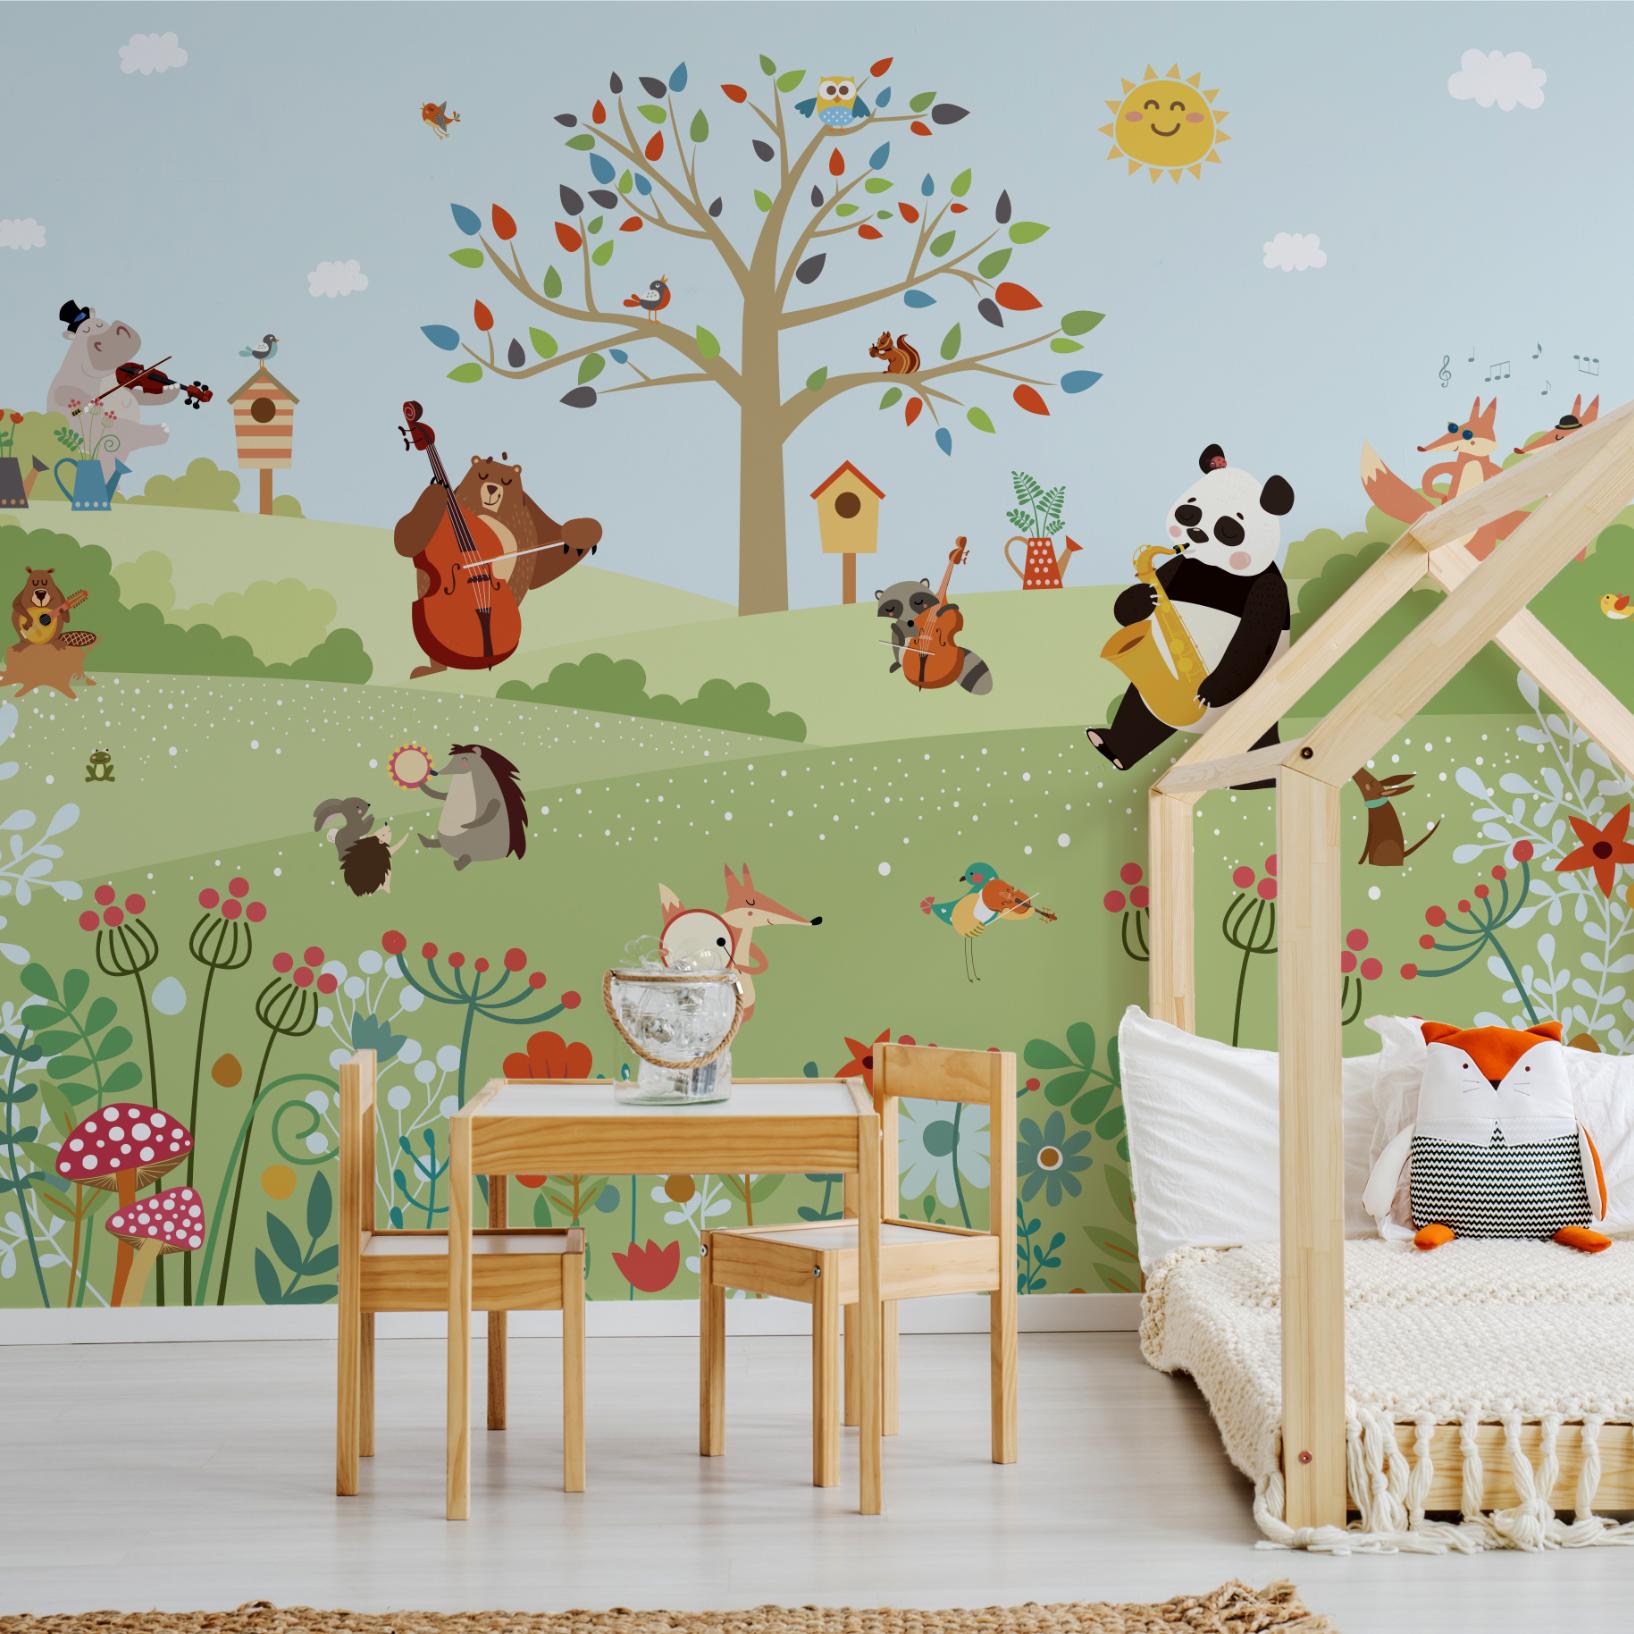 baby design wallpaper, baby interior design, cameretta